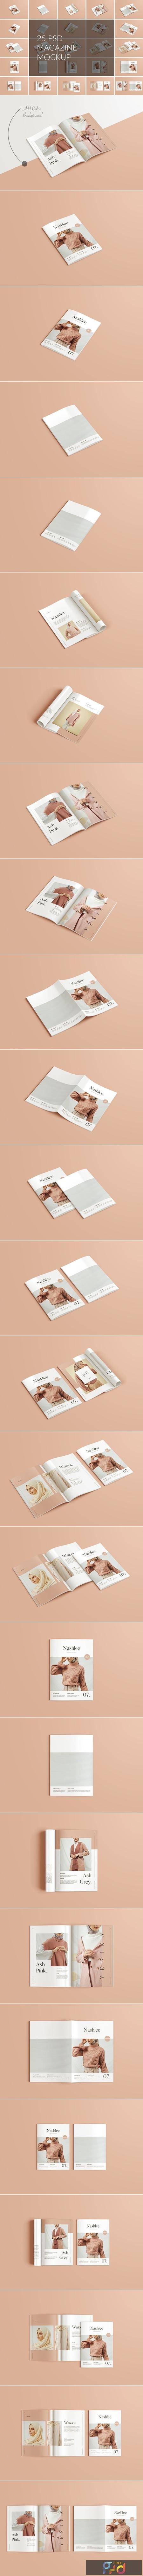 A4 A5 Magazine Brochure Mockup 4330891 1